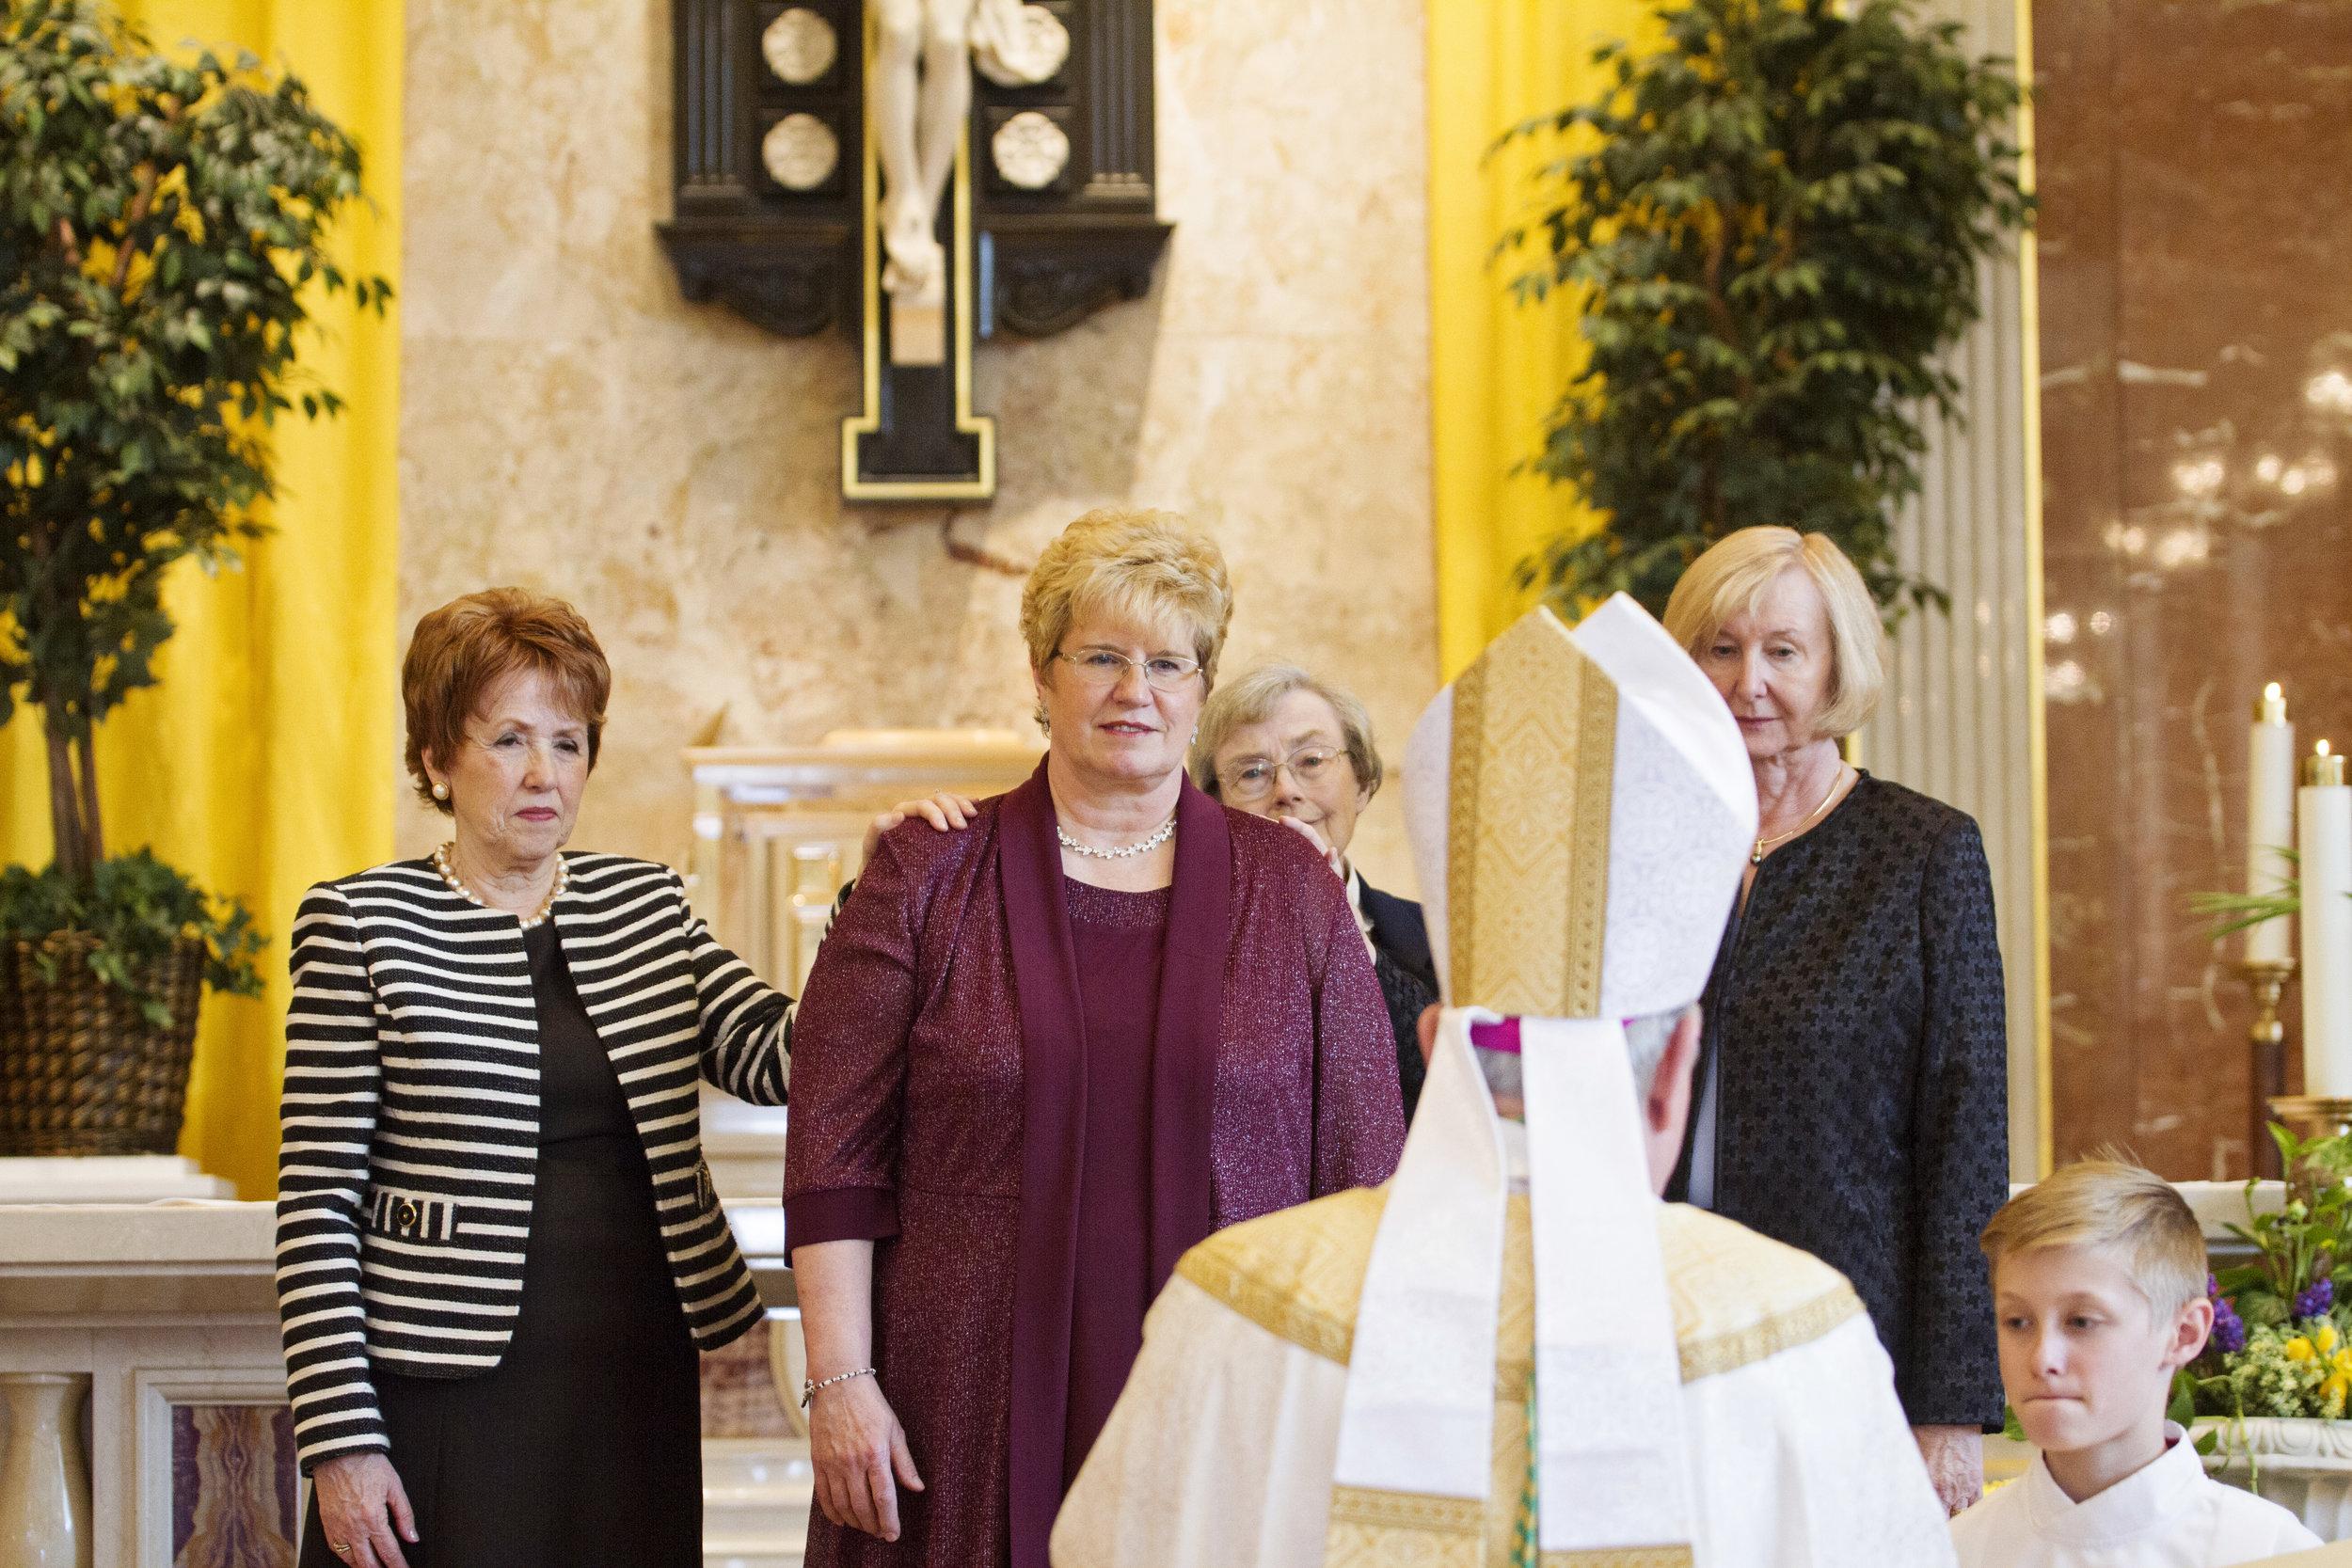 Inauguration Mass